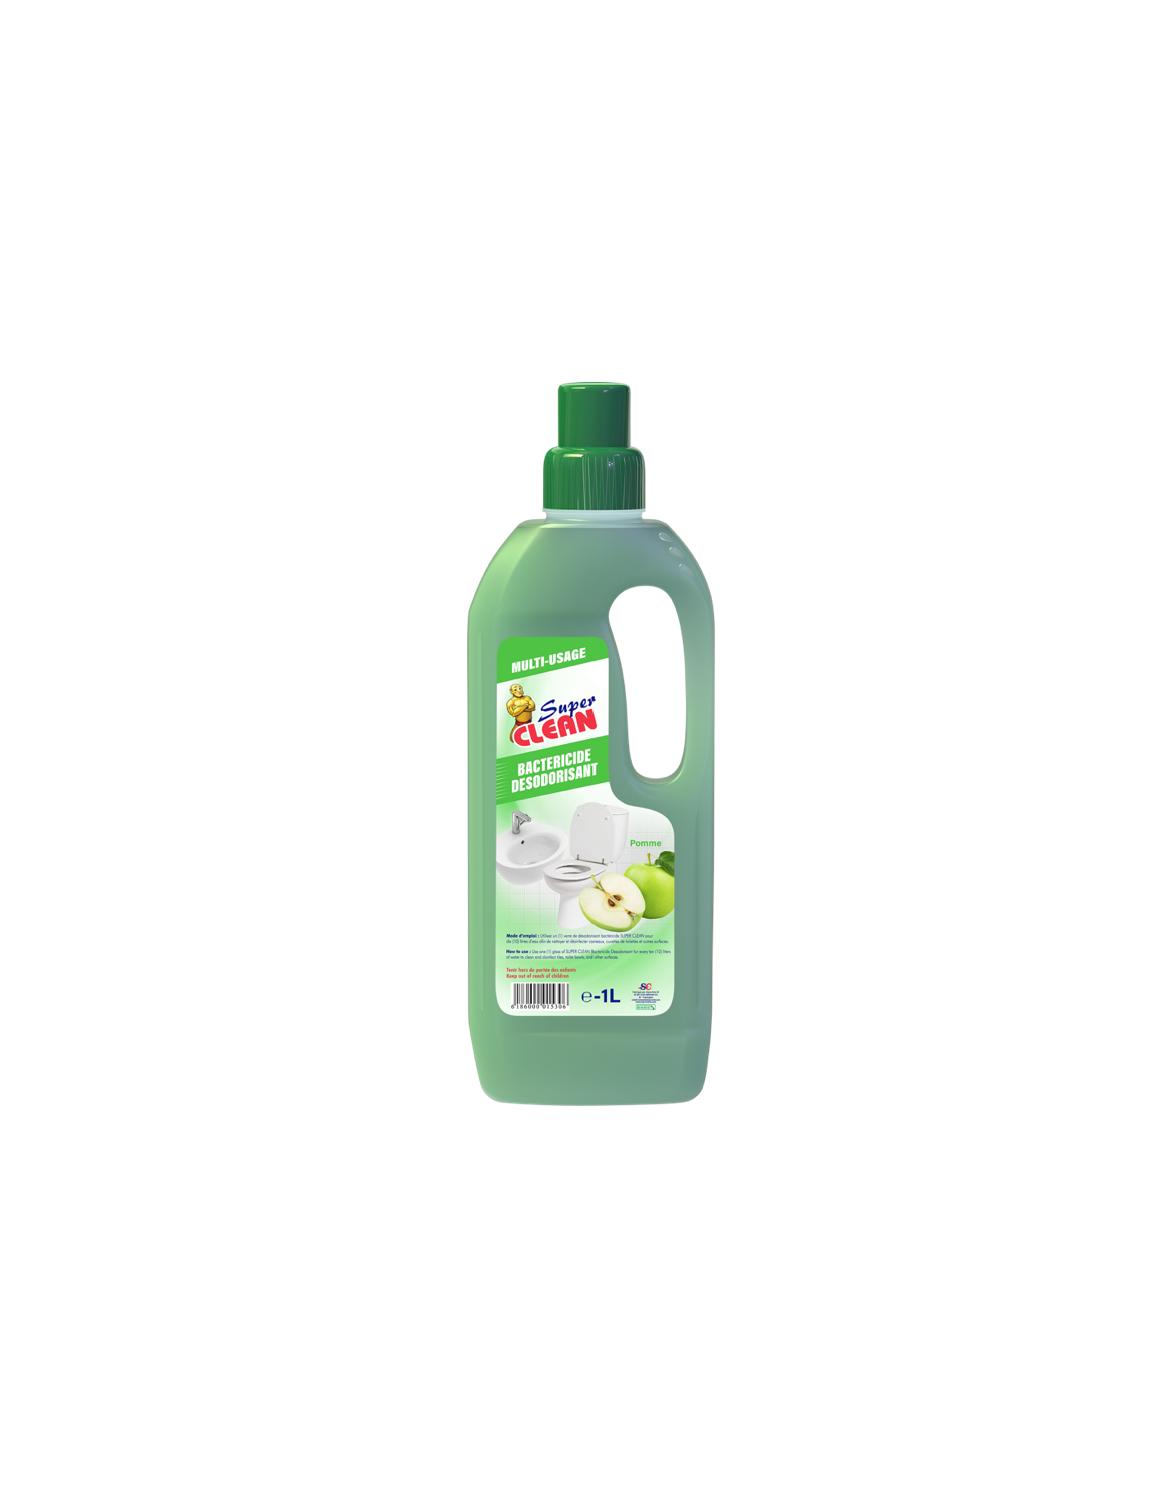 Bactéricide Super Clean Pomme Verte 1L_Siprochim